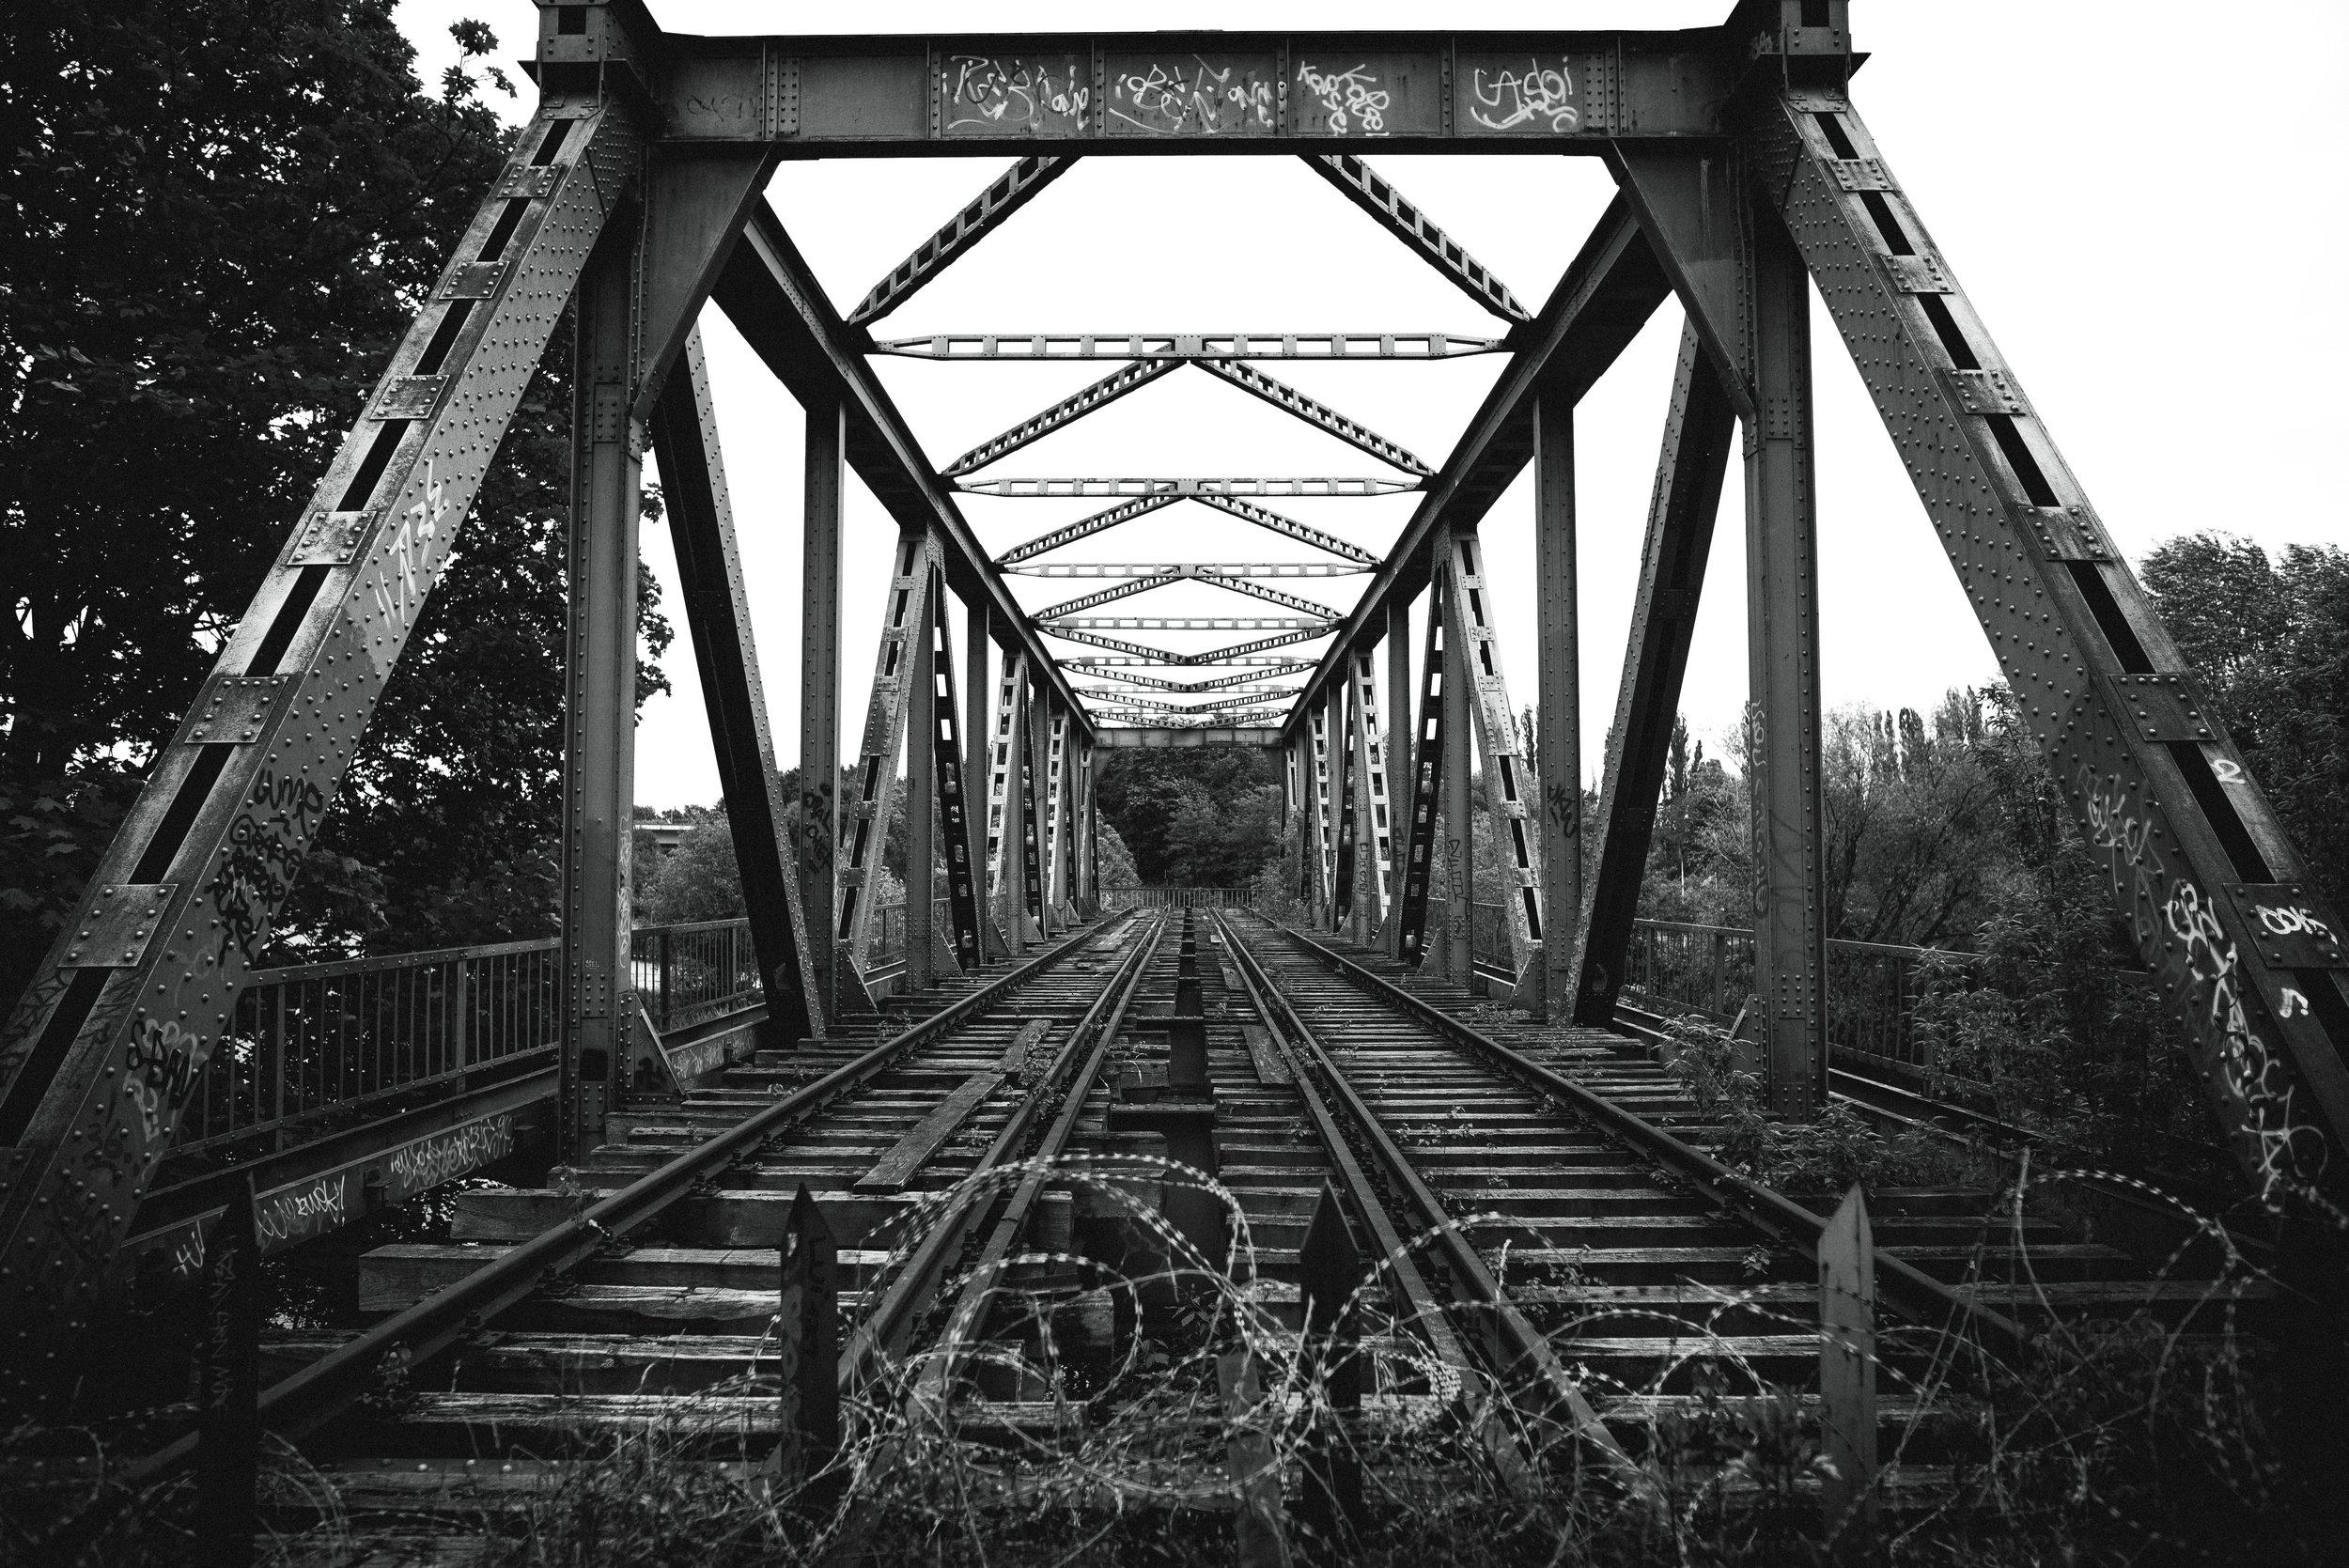 abandoned bridge and train tracks in siemensstadt.